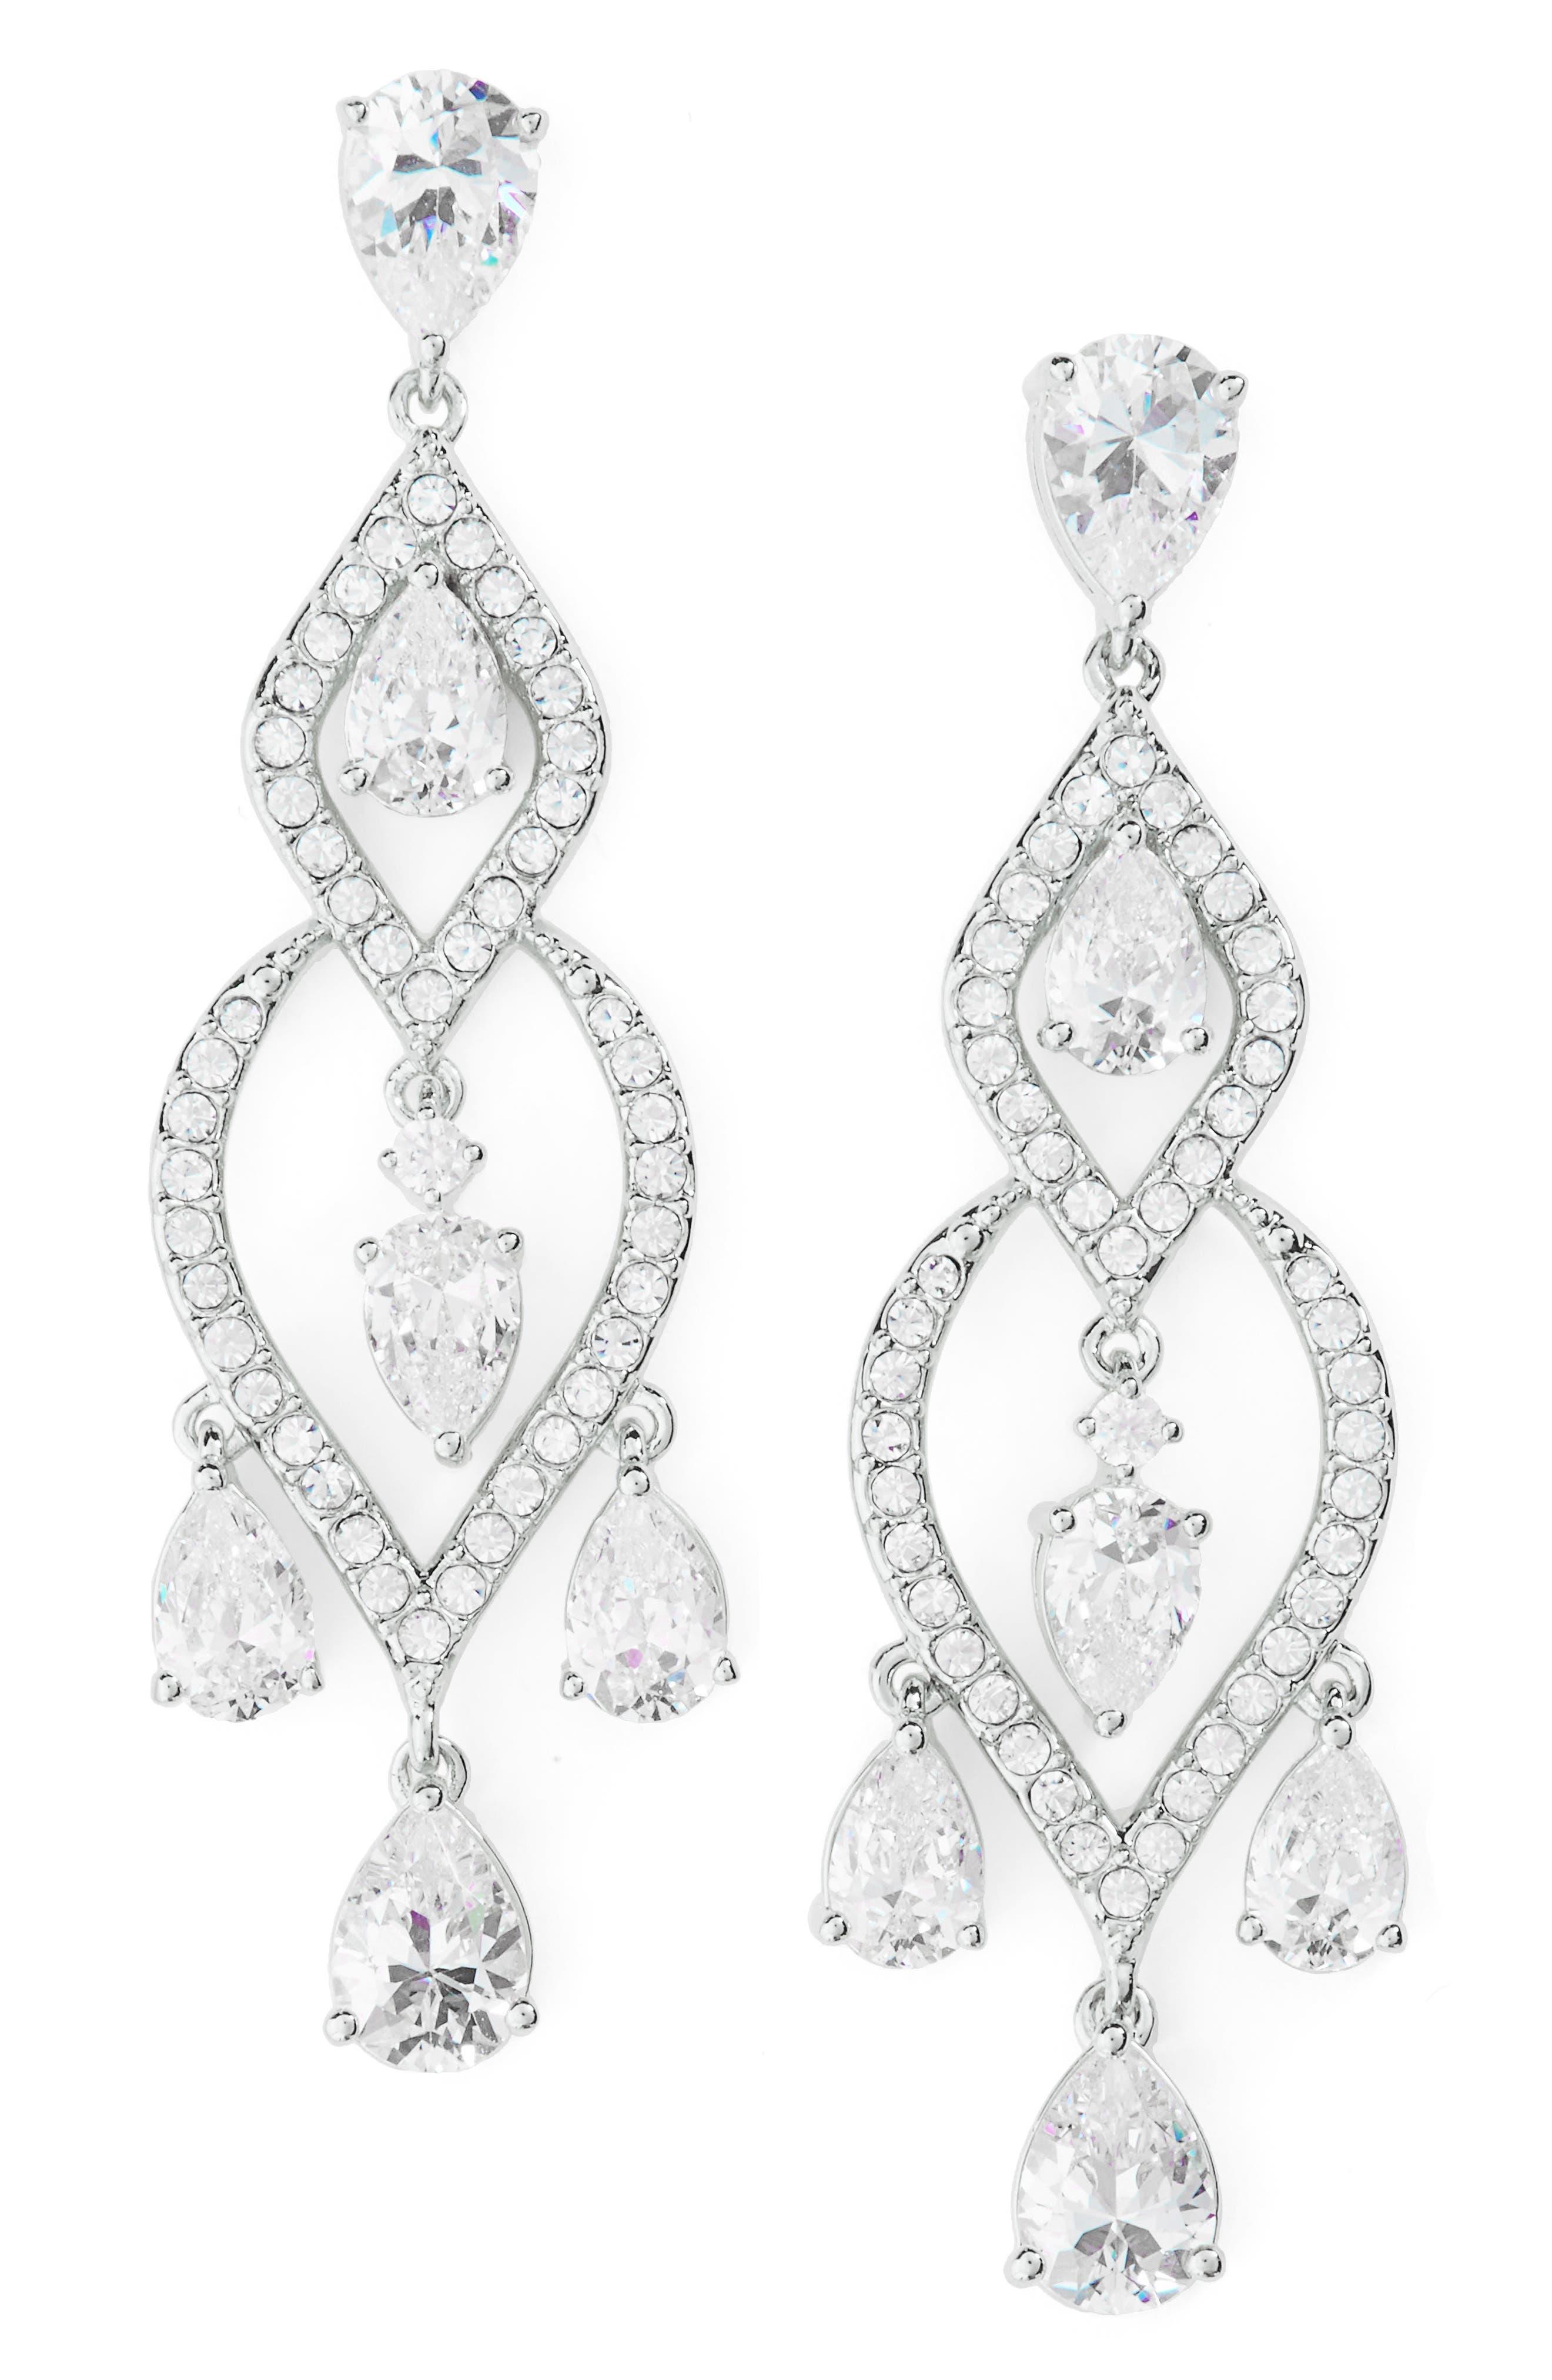 Legacy Chandelier Earrings,                         Main,                         color, Silver